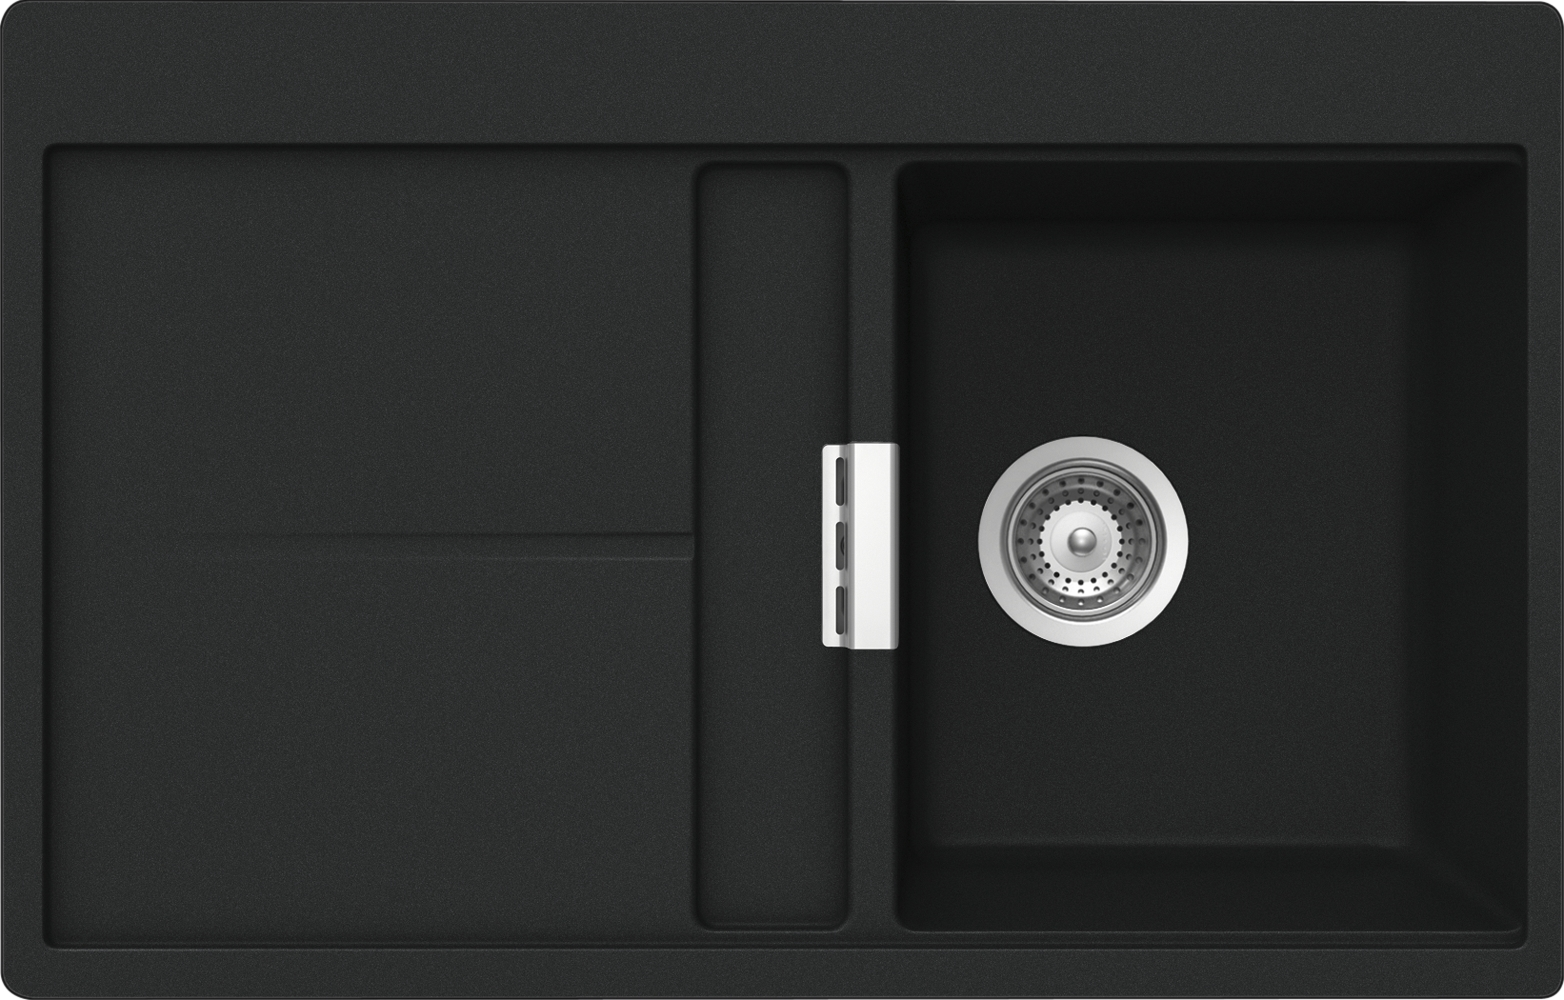 d ezy schock cristadur jednod ezy s odkapem schock horizont d 100 magma granitov d ezy. Black Bedroom Furniture Sets. Home Design Ideas